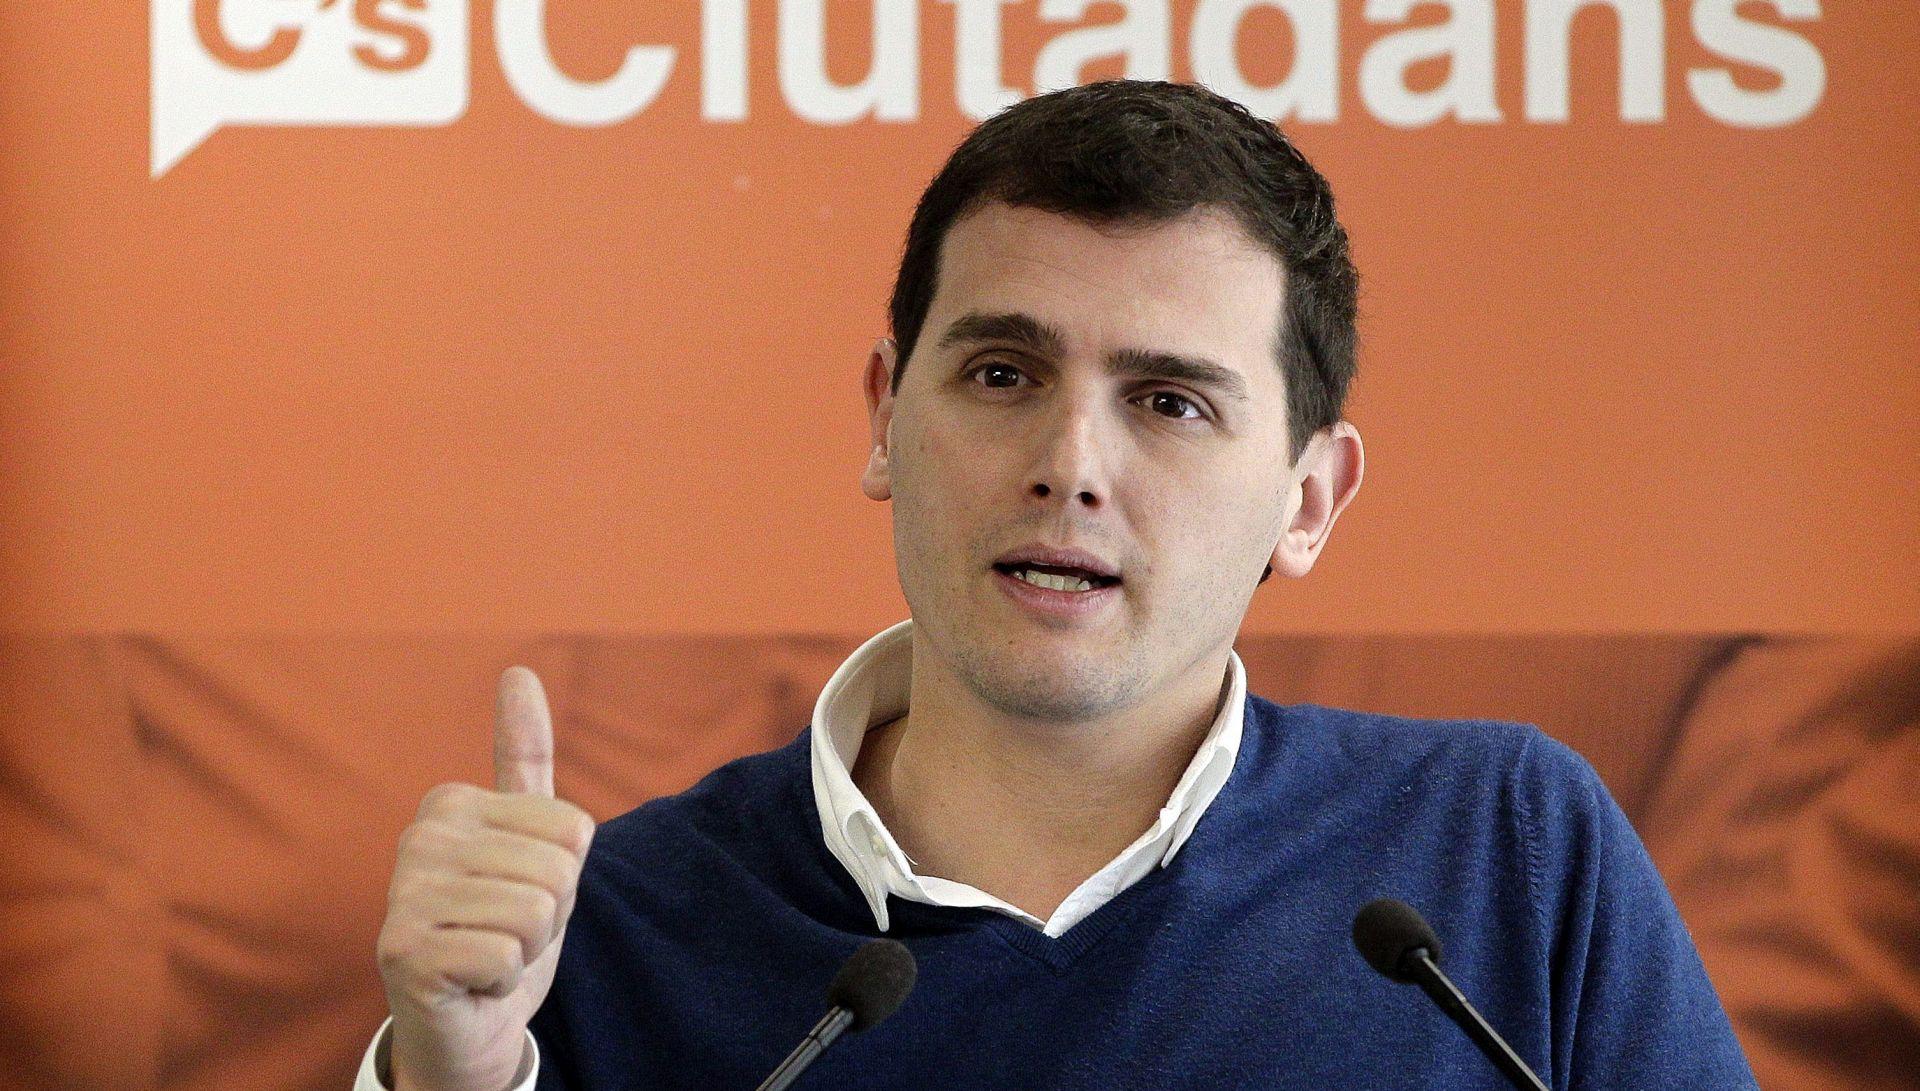 ŠPANJOLSKA Sánchez na korak od neuspjeha da formira novu vladu